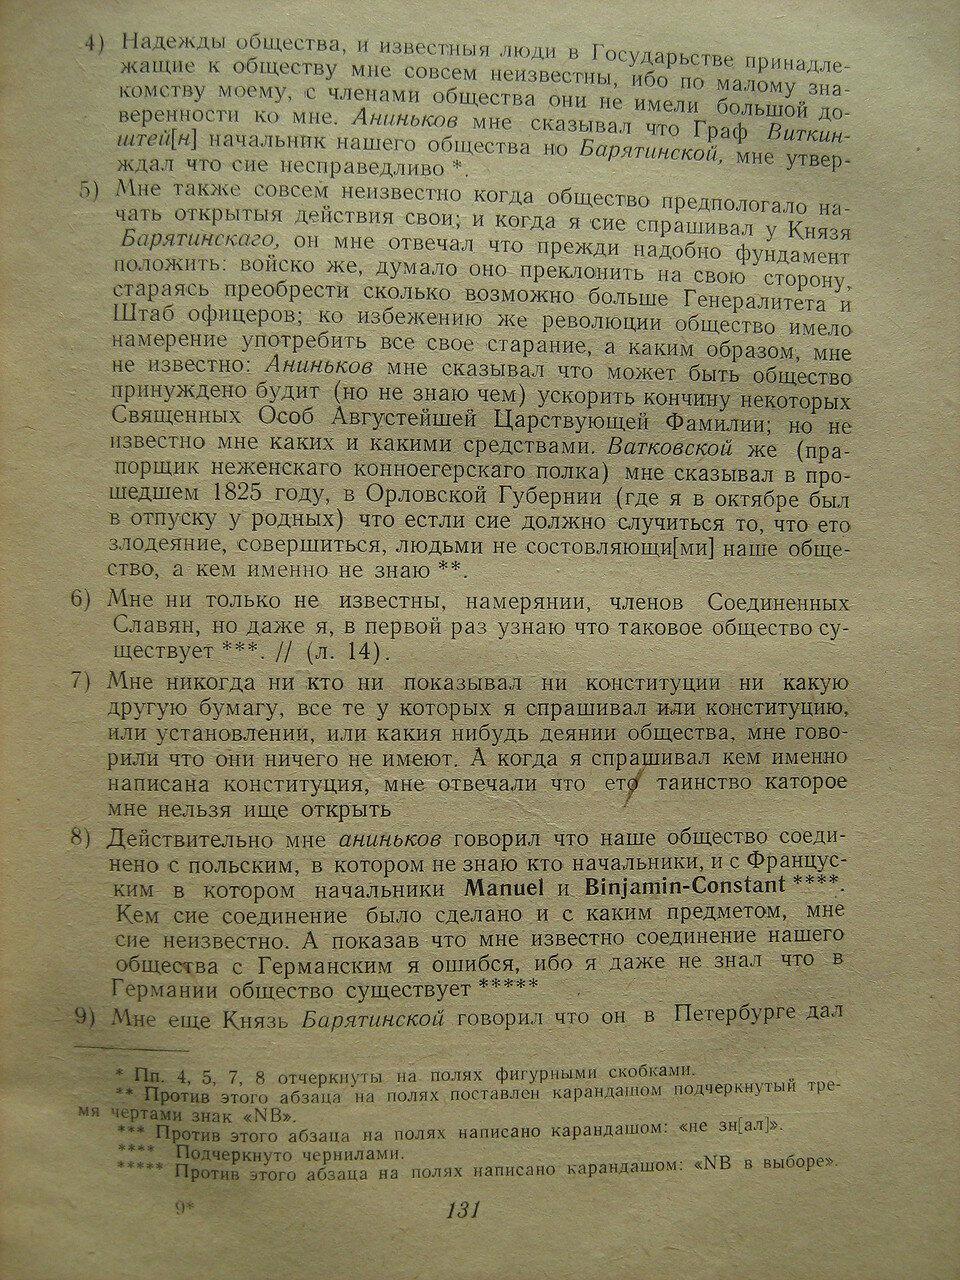 https://img-fotki.yandex.ru/get/914565/199368979.b6/0_2179f2_c21b548_XXXL.jpg